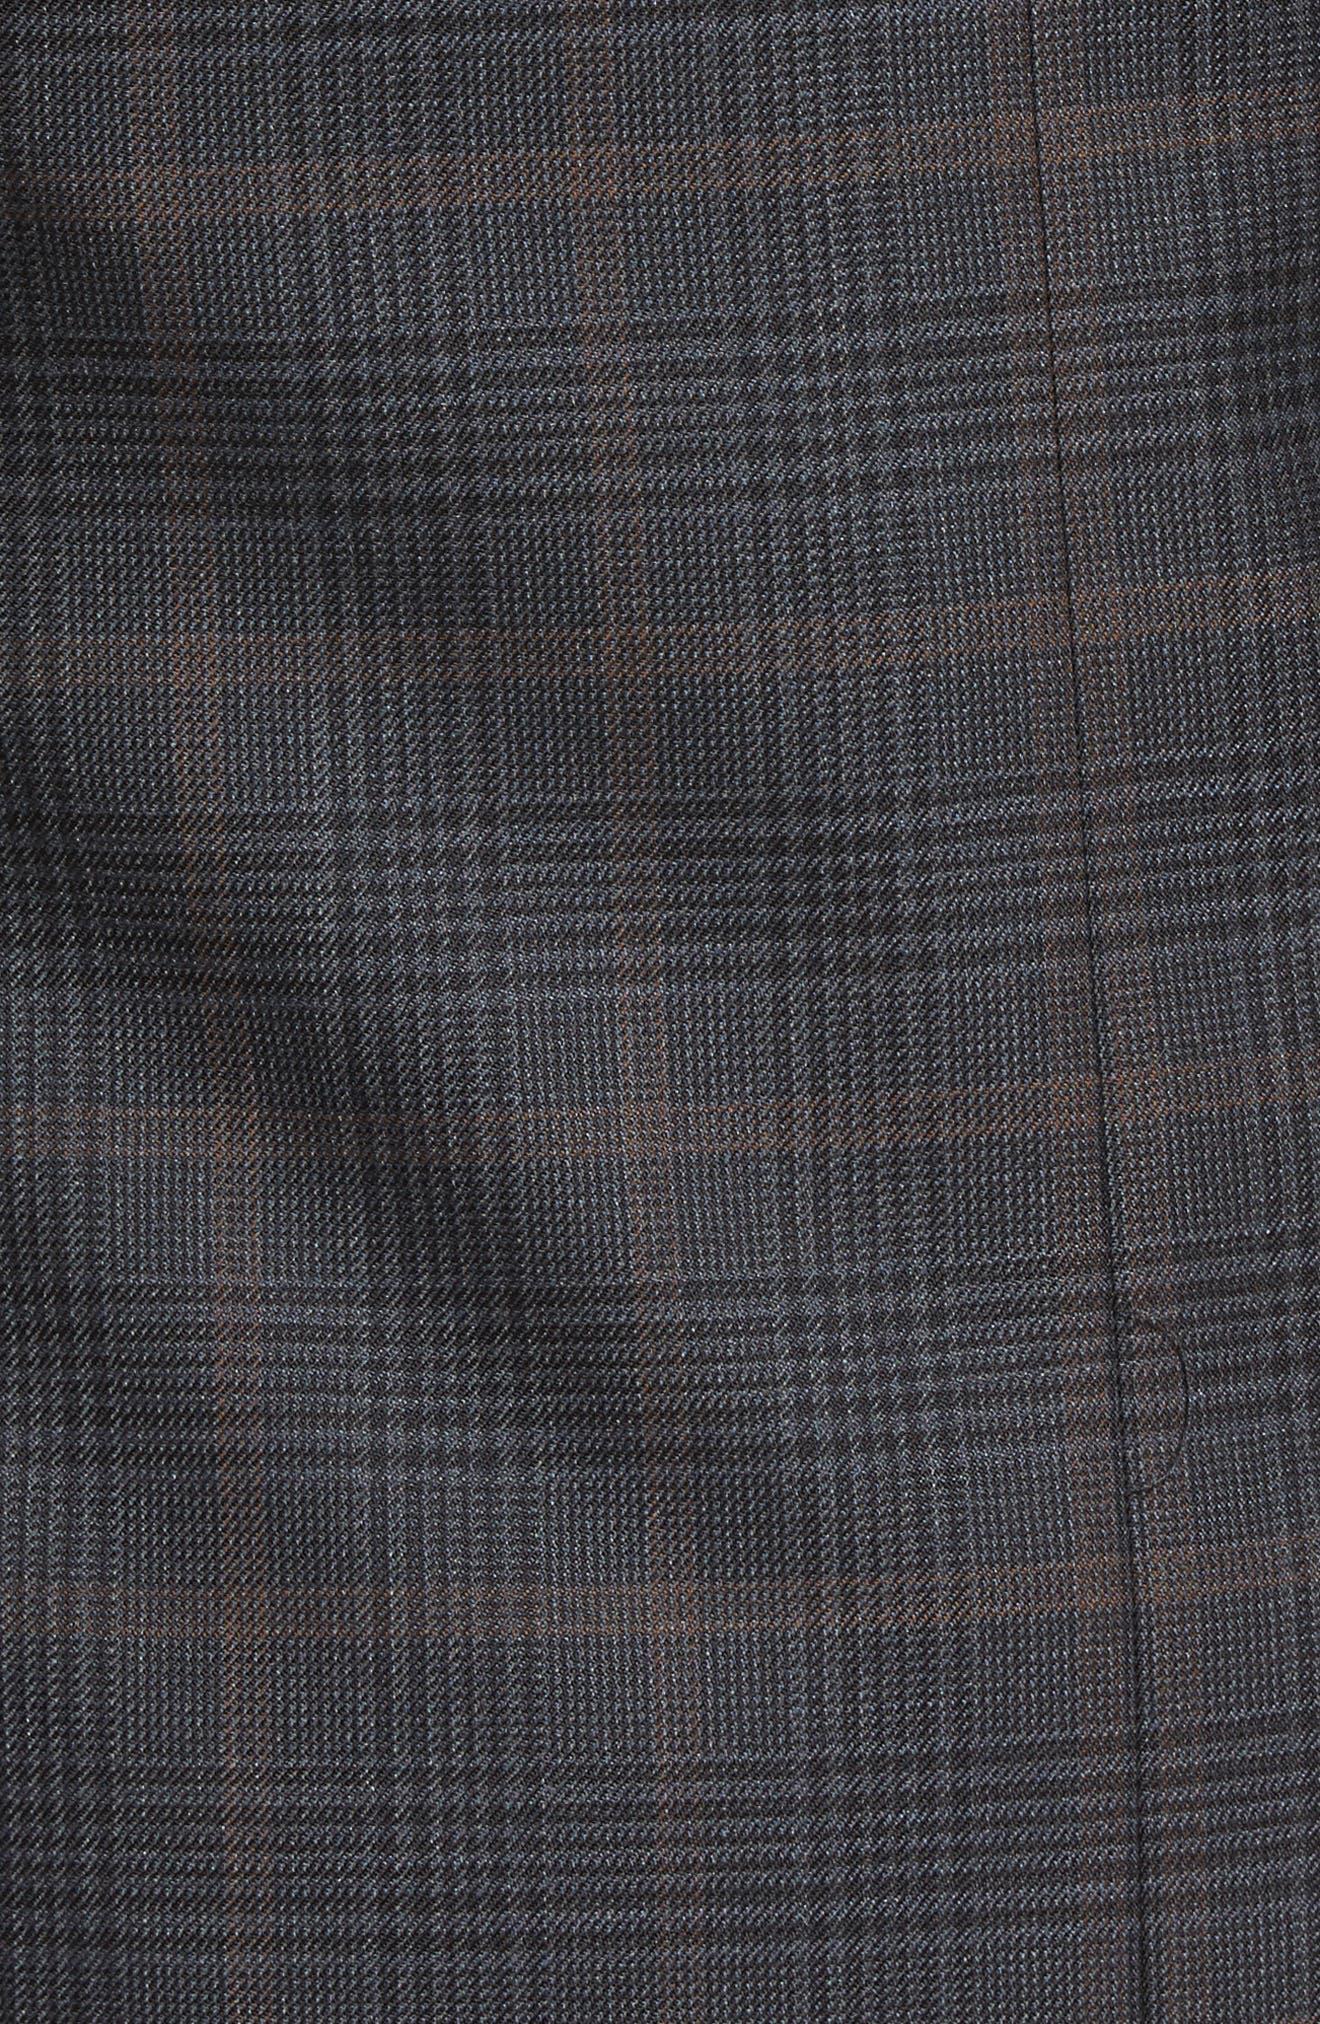 Classic Fit Plaid Wool Sport Coat,                             Alternate thumbnail 5, color,                             021